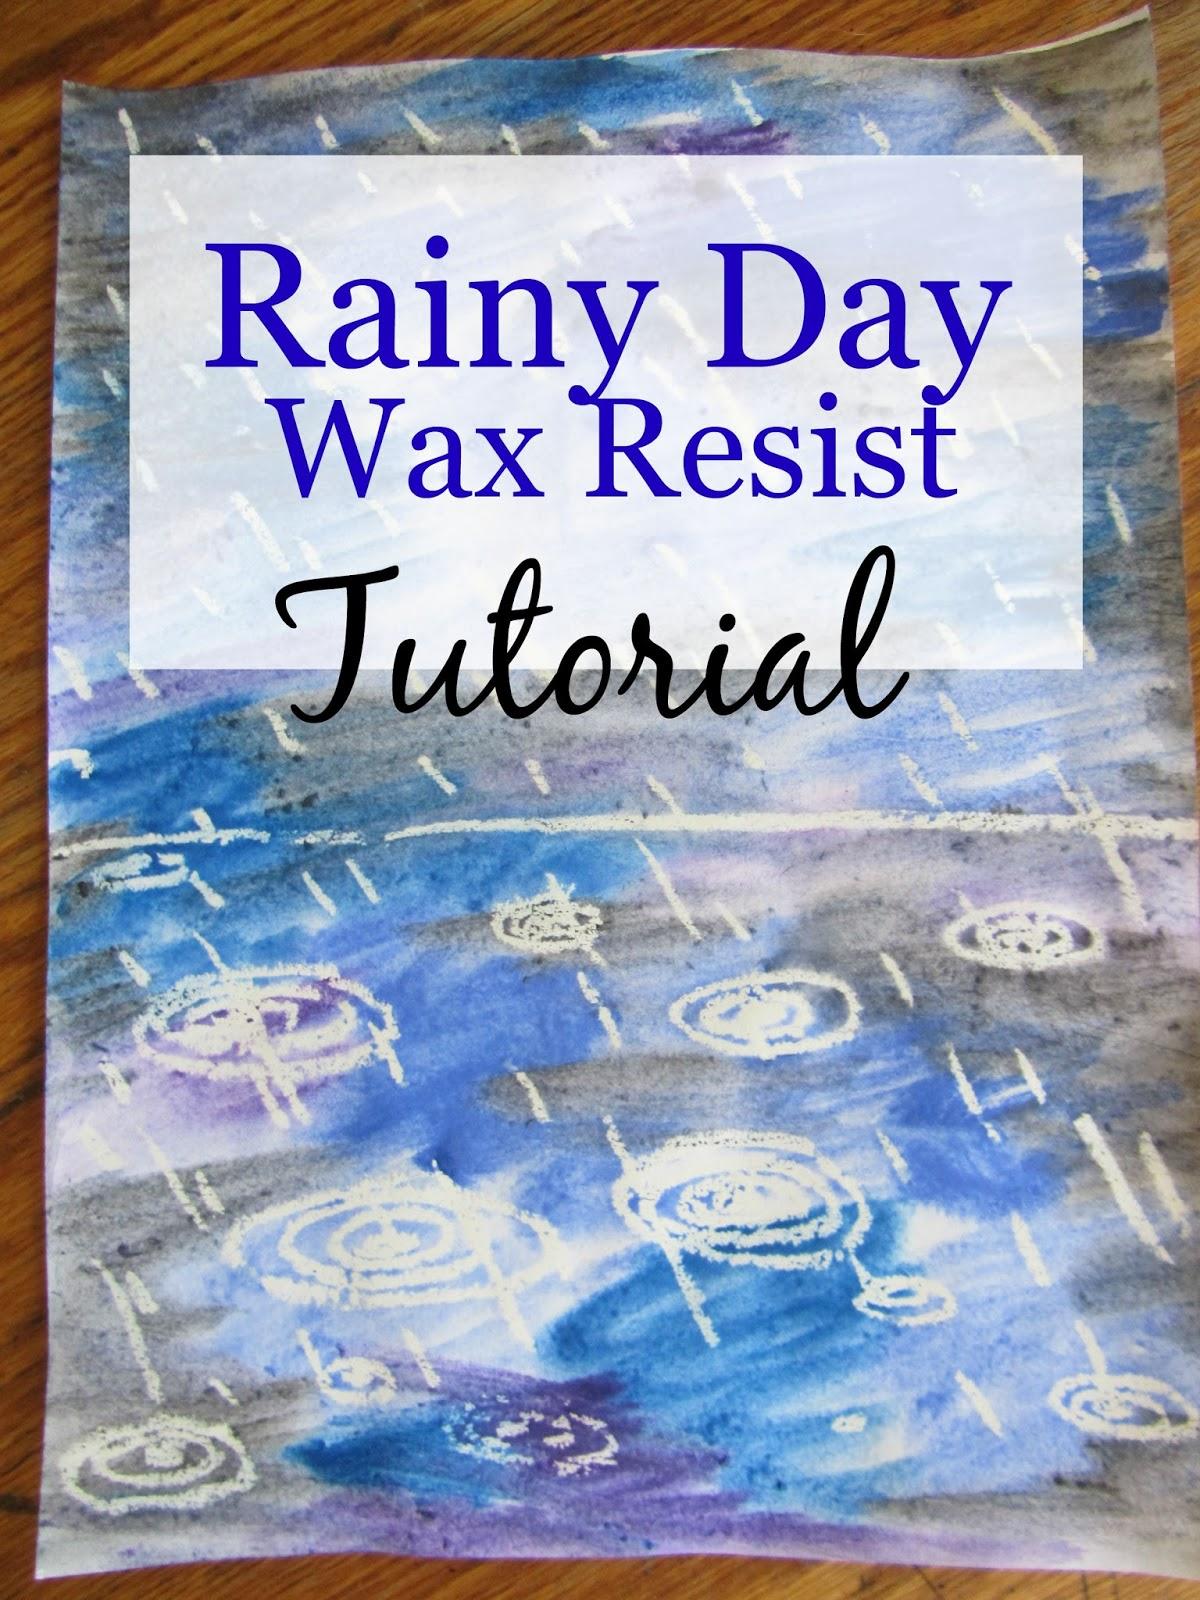 The Unlikely Homeschool Rainy Day Wax Resist Art Tutorial